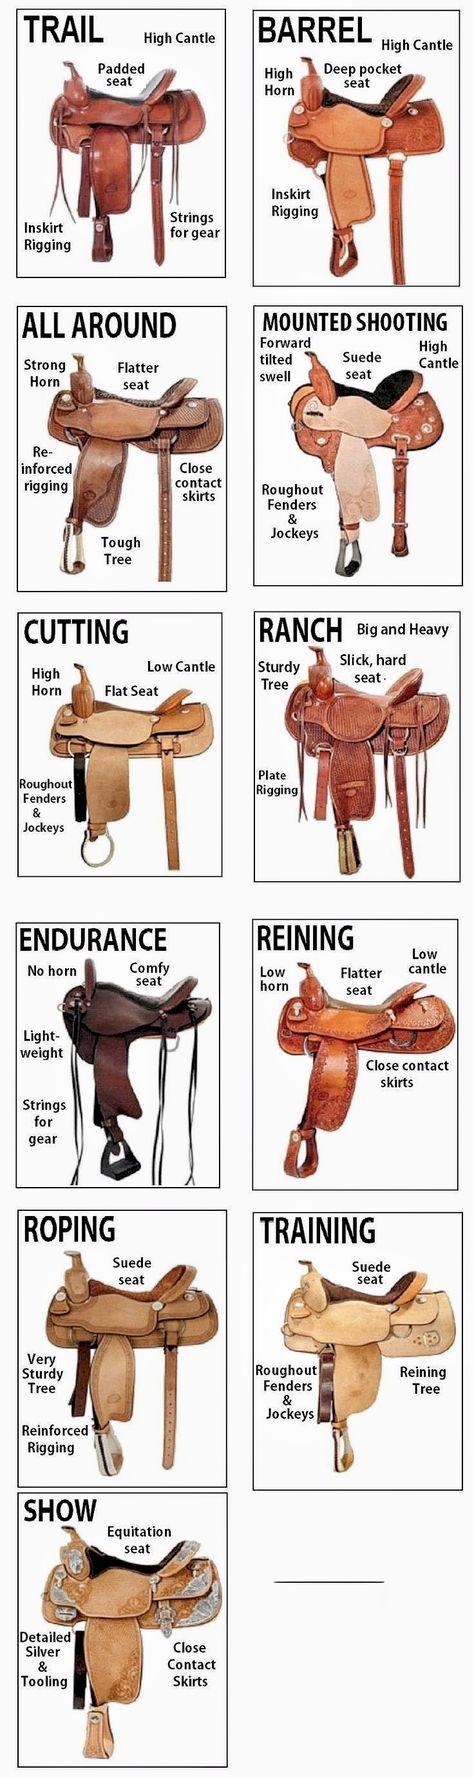 Western saddle comparisons western saddle comparisons - Art Of Equitation Horse Gear, Horse Riding Tips, Horse Tips, Western Horse Riding, Cowboy Horse, Pretty Horses, Horse Love, Beautiful Horses, Cavalo Wallpaper